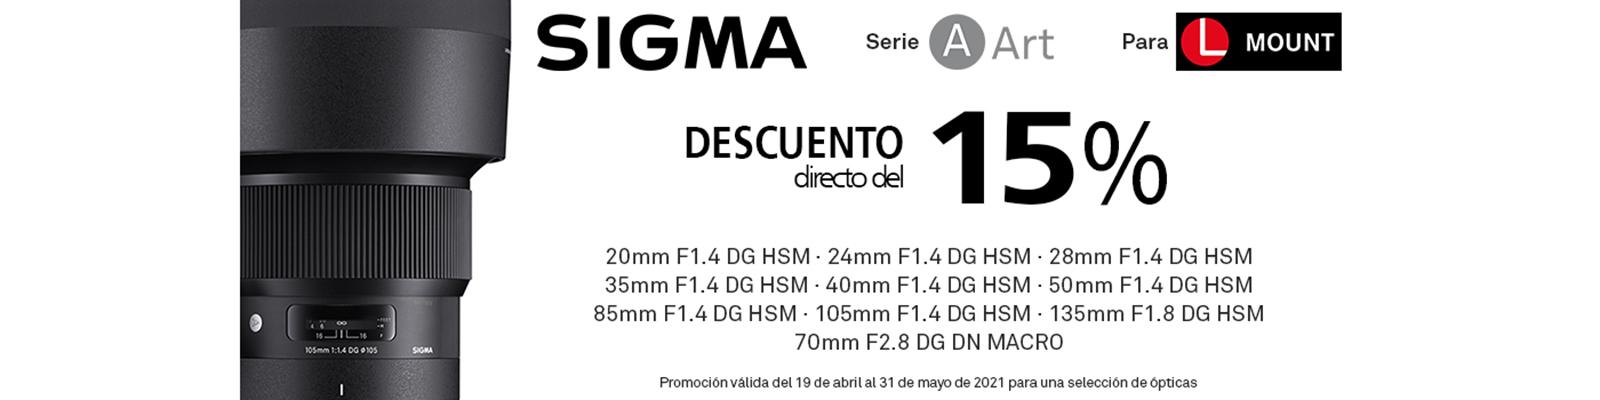 Oferta Sigma LMount